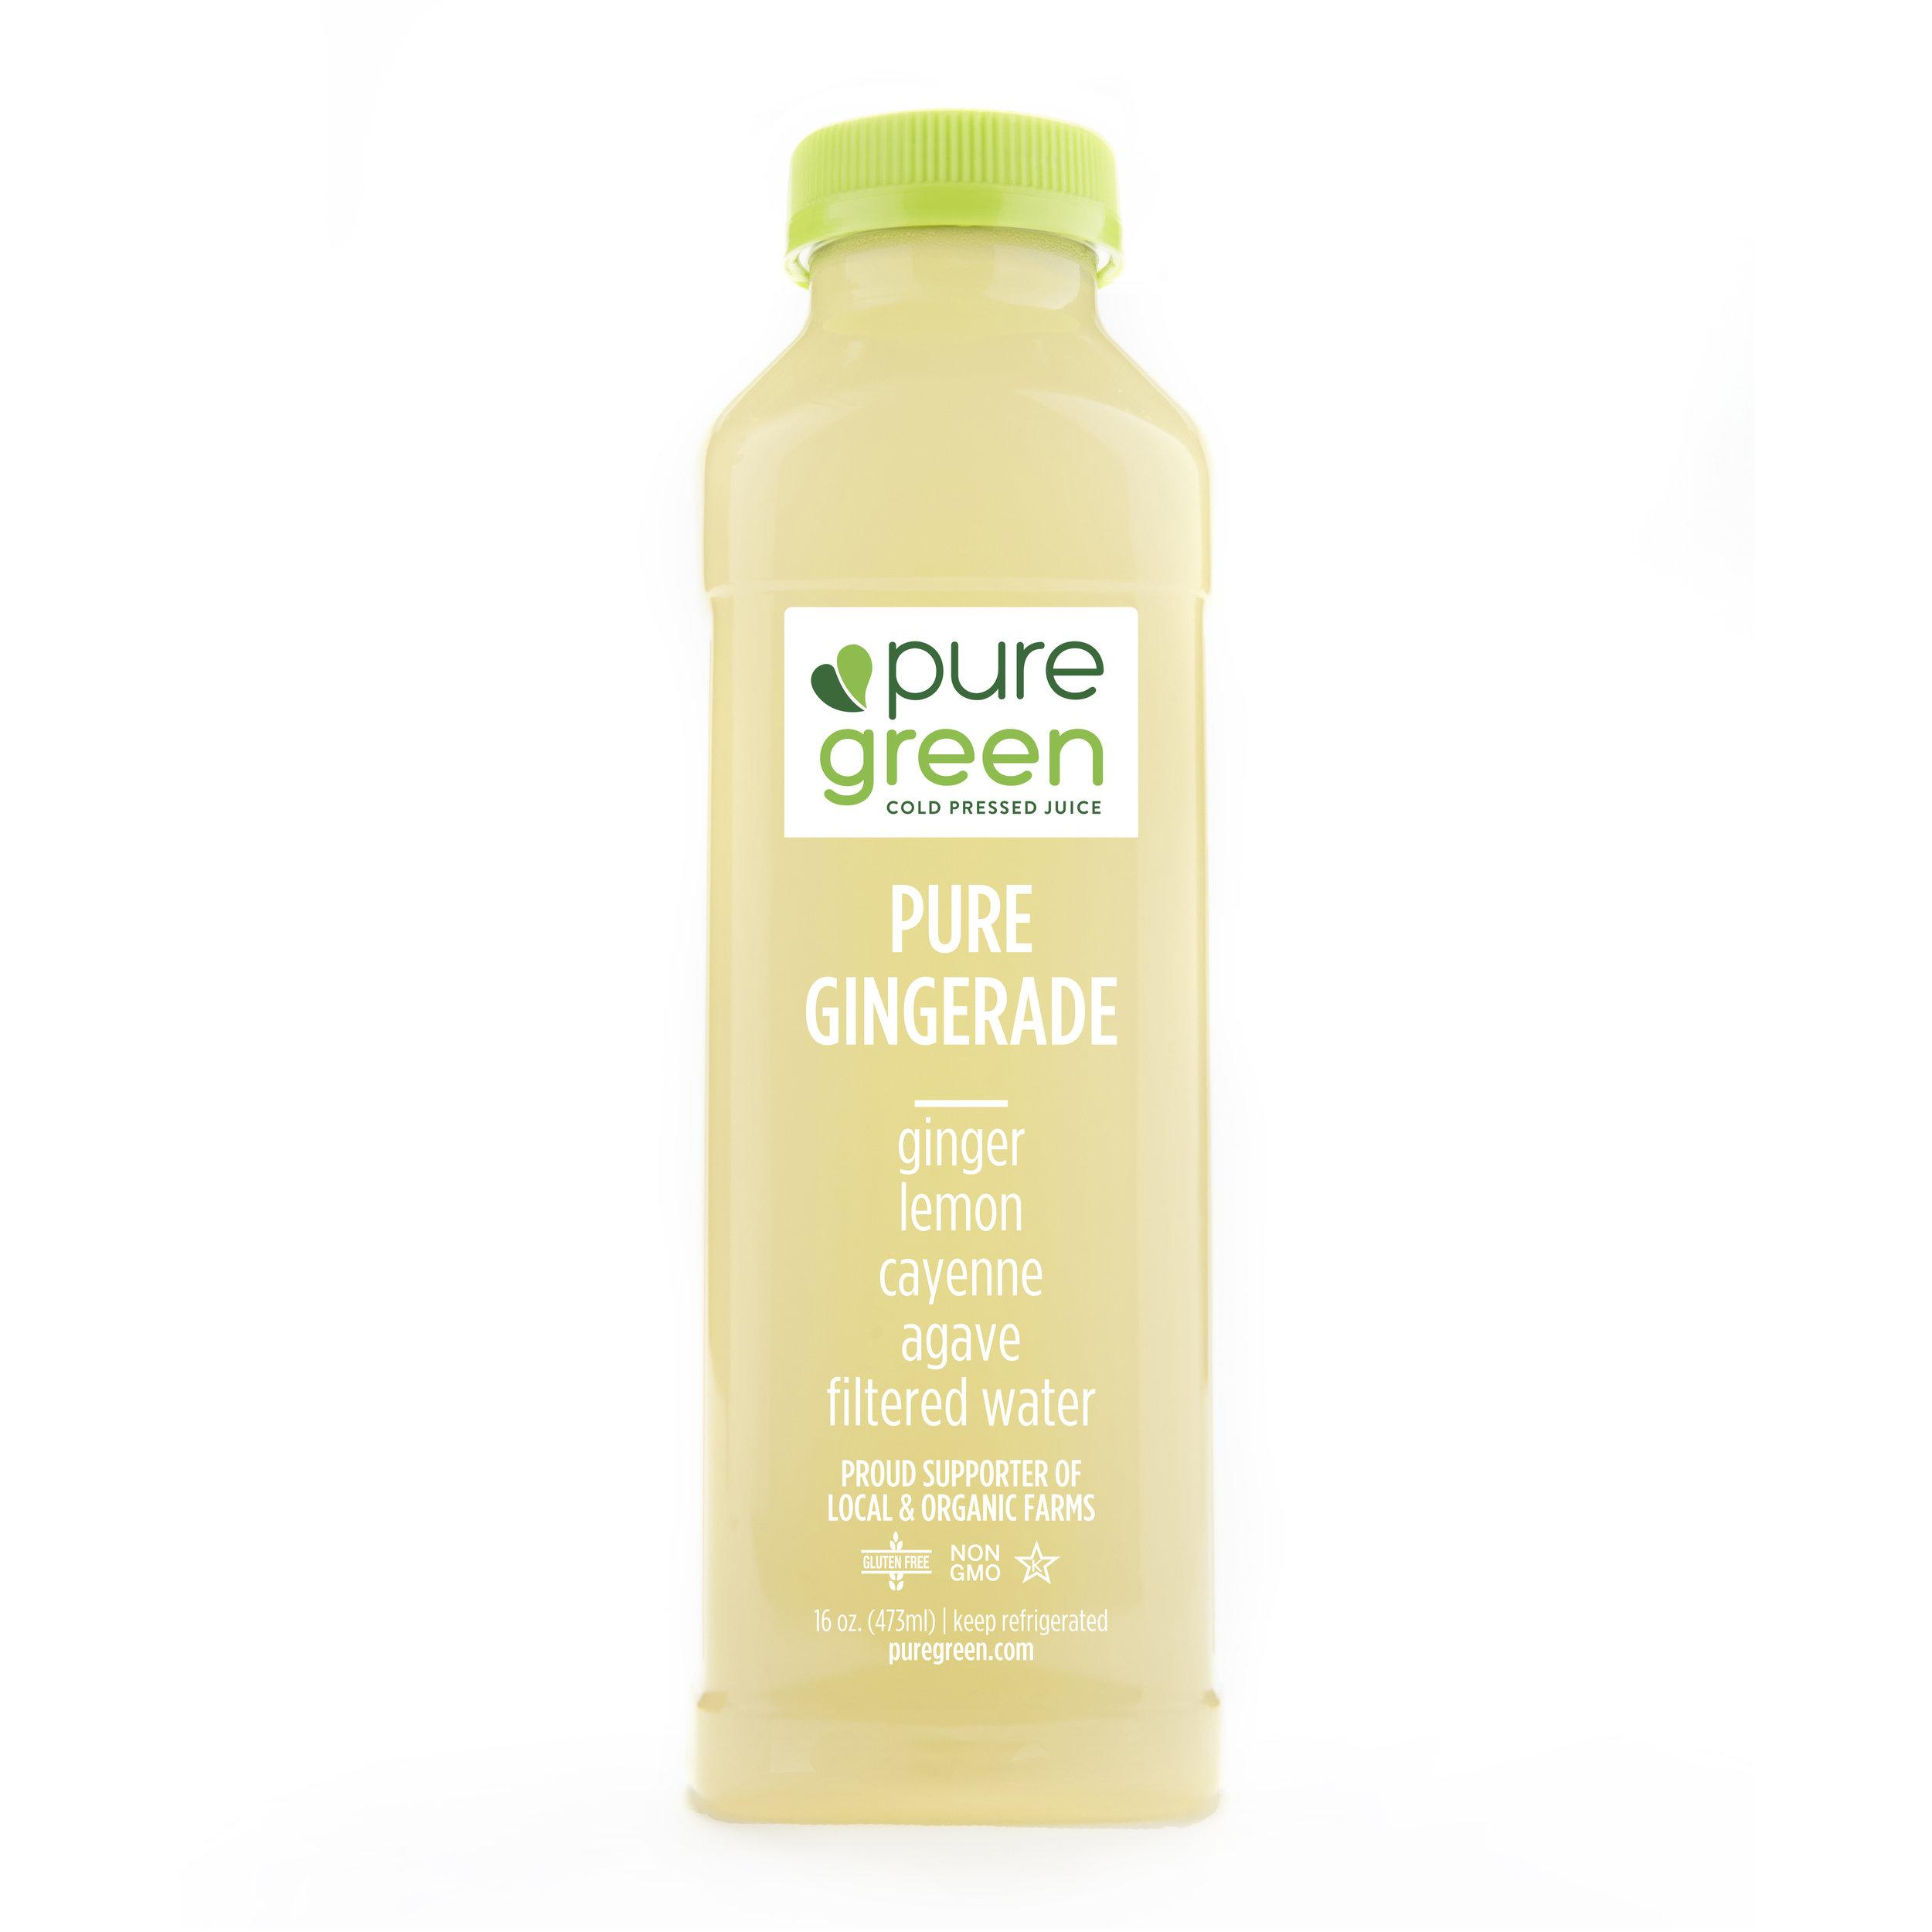 Gingerade 16oz Juice.jpg